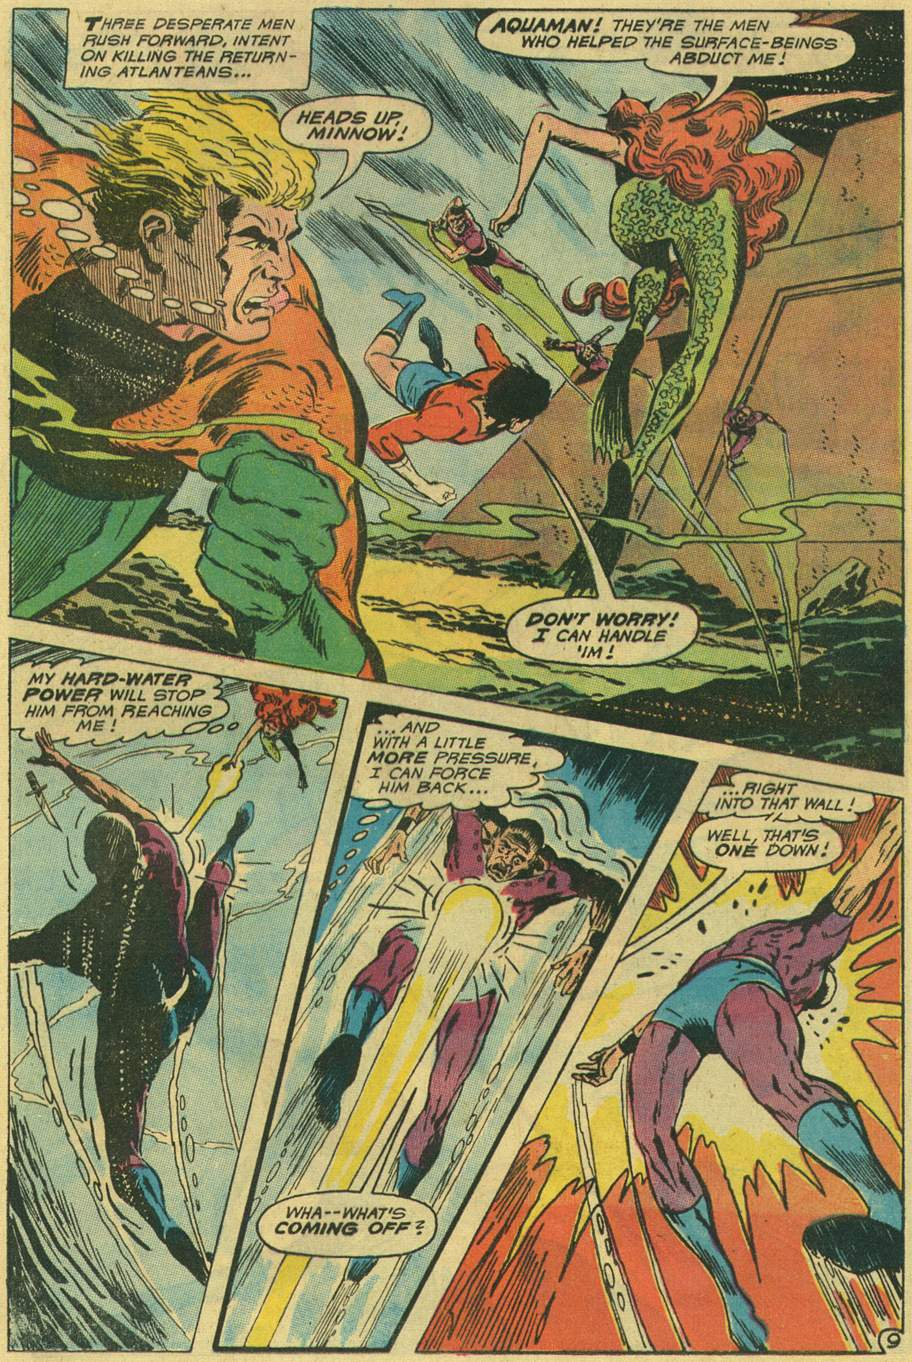 Read online Aquaman (1962) comic -  Issue #48 - 13